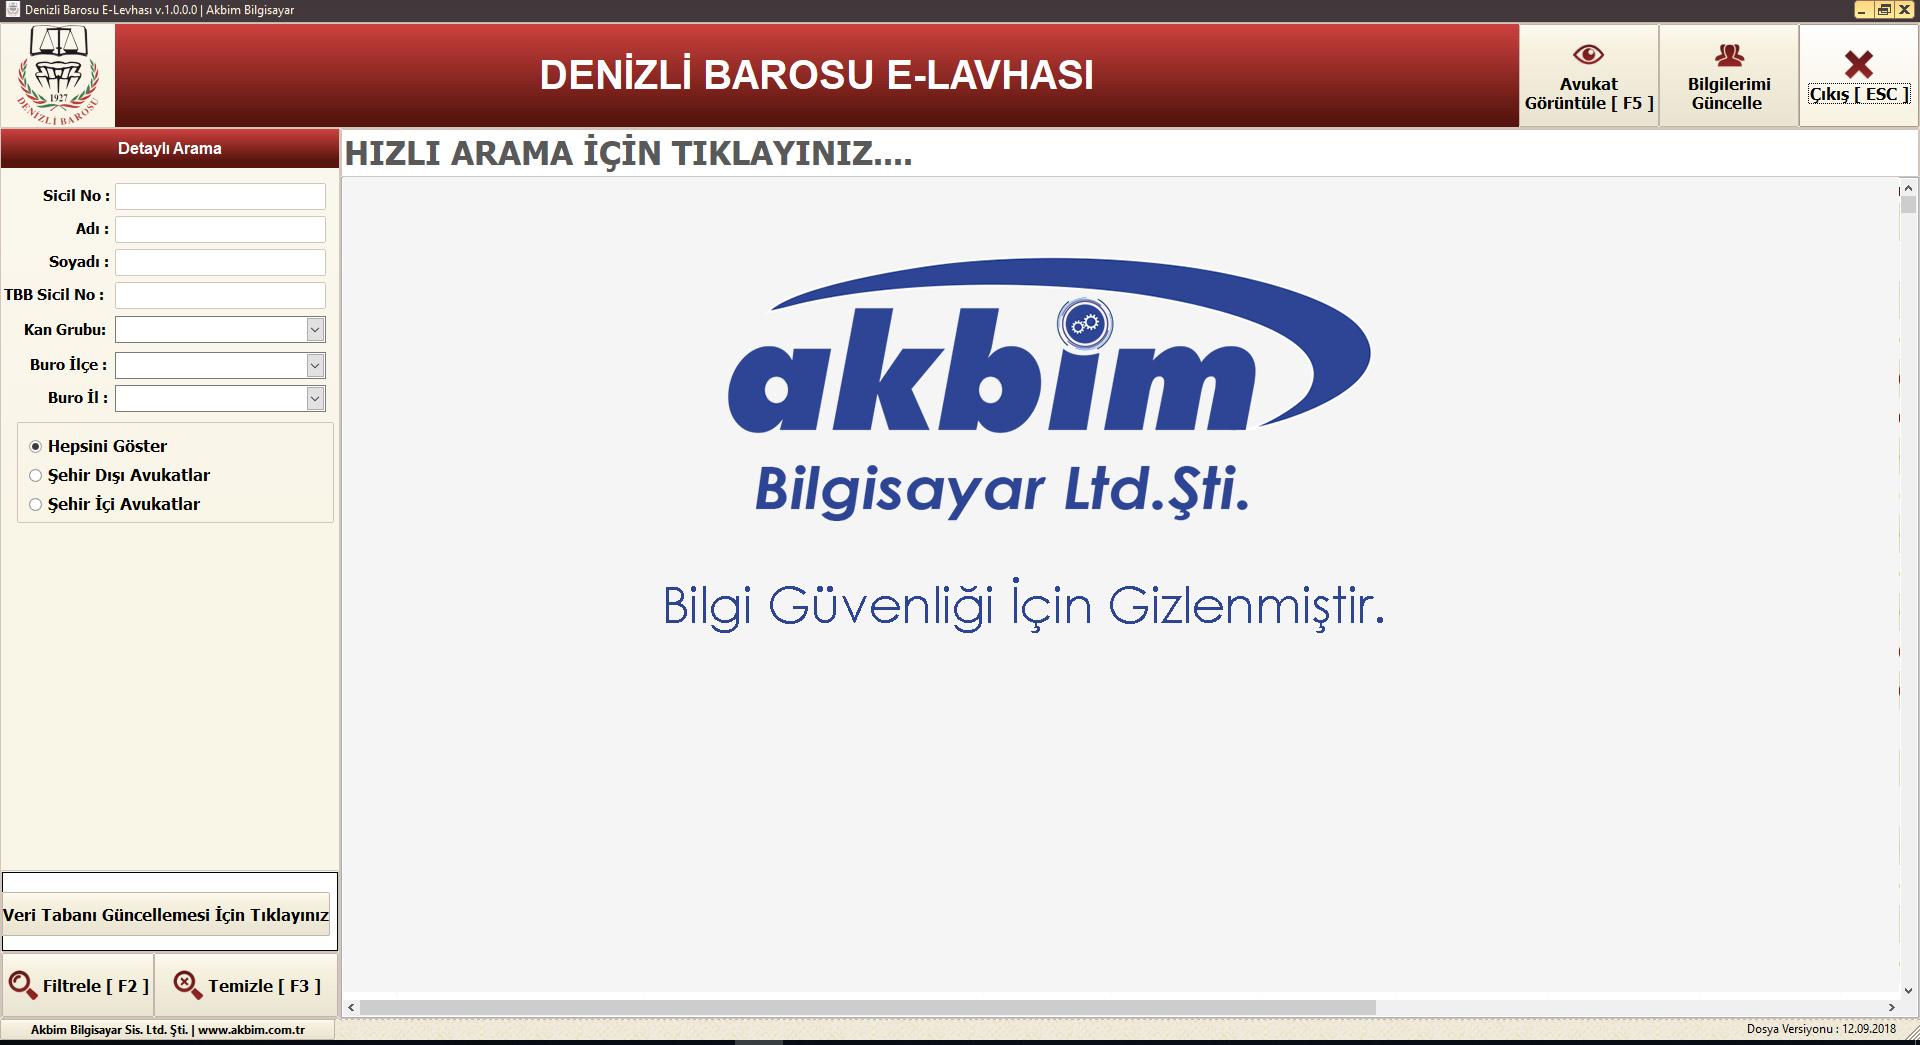 Aydın Barosu E-Levha - Akbim Bilgisayar